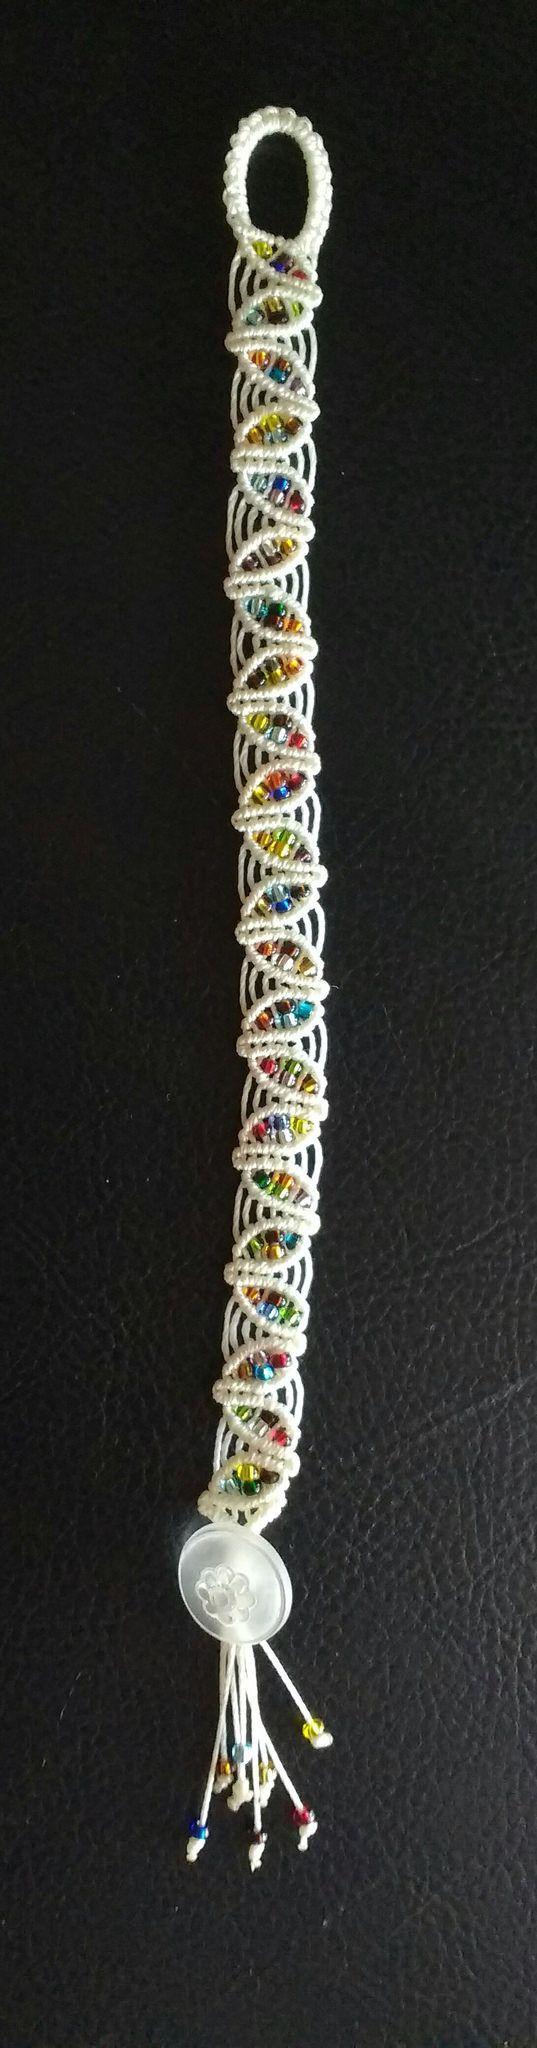 https://flic.kr/p/KxCKAt | Spring leaf macrame'bracelet in vanilla c- lon with multicolors seed beads